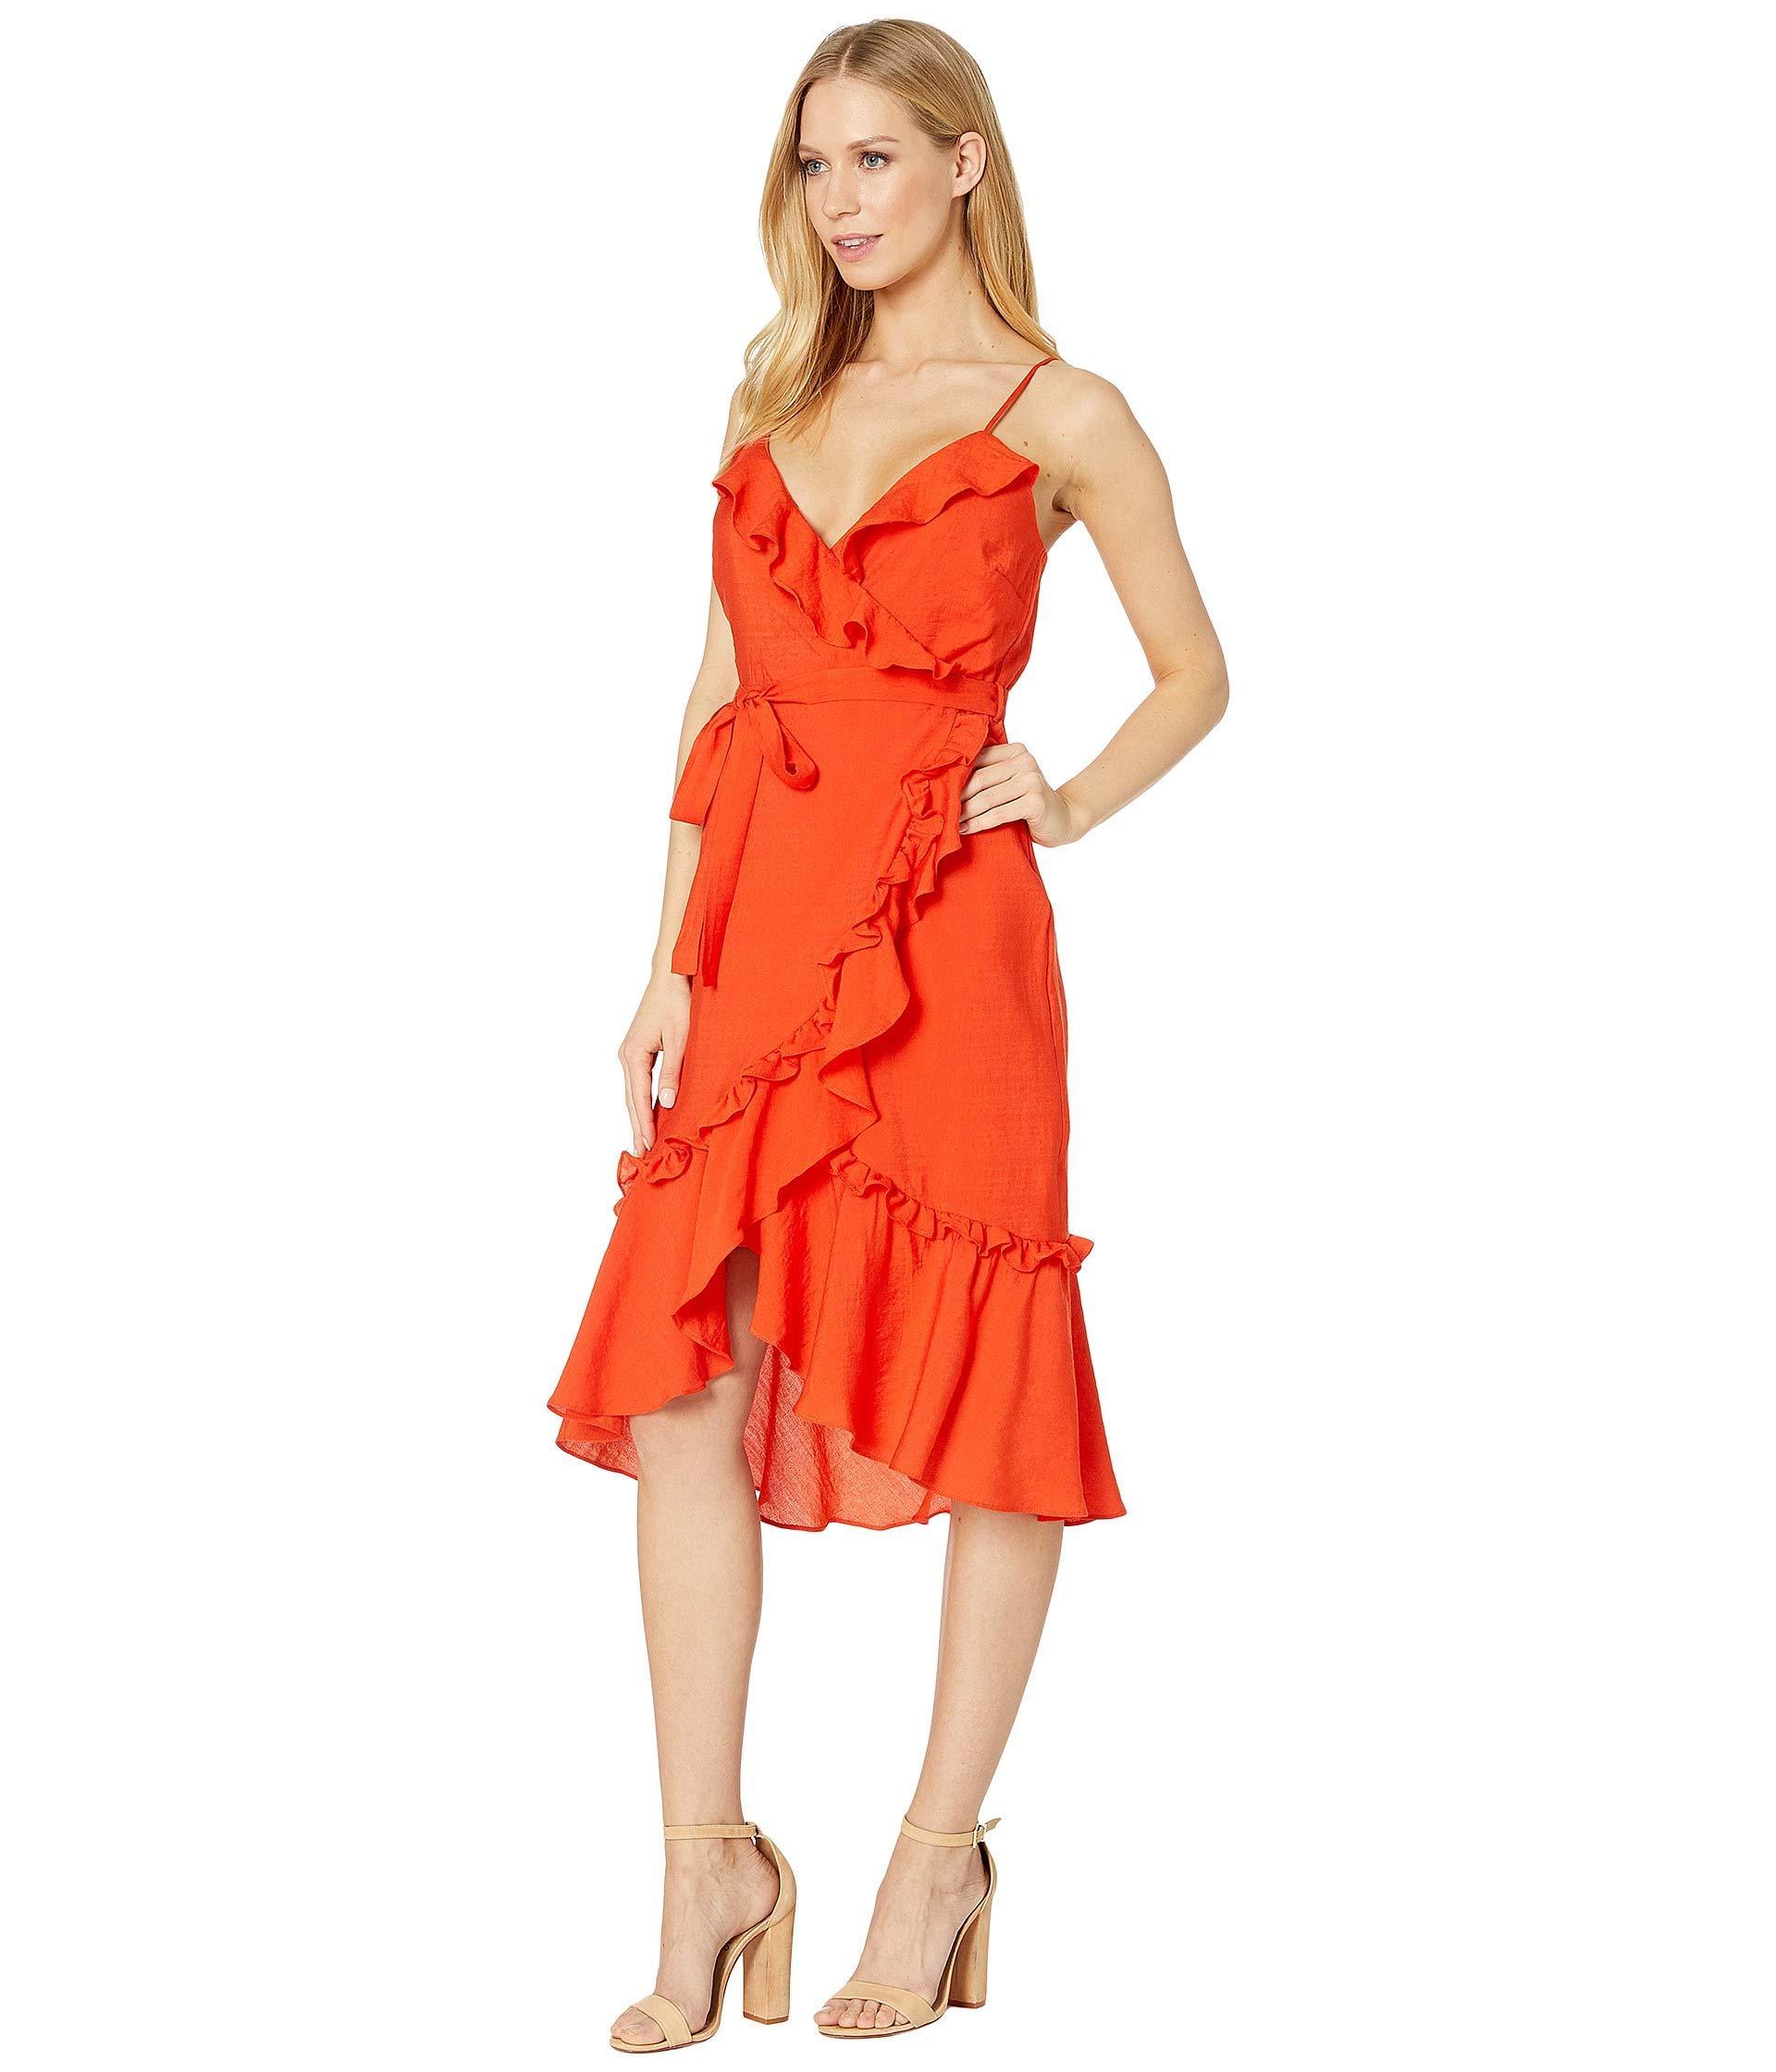 d1e7e5c20c74 Lyst - Bardot Zoe Wrap Dress (flame Orange) Women's Dress in Orange